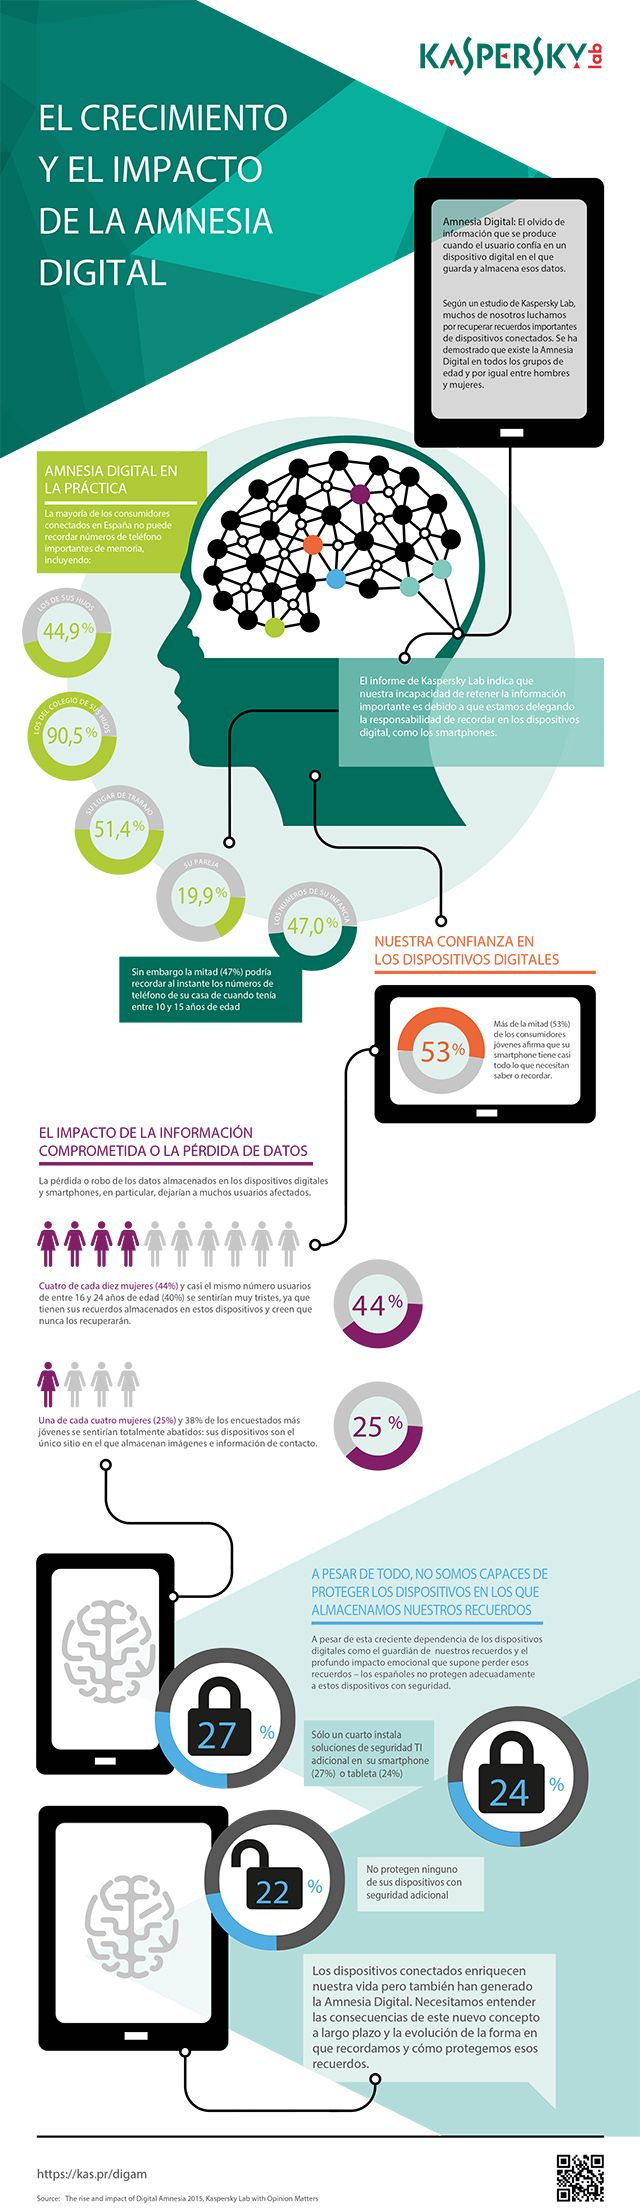 ES_v2_baja_004 Kaspersky Digital Amnesia Infographic_FINAL